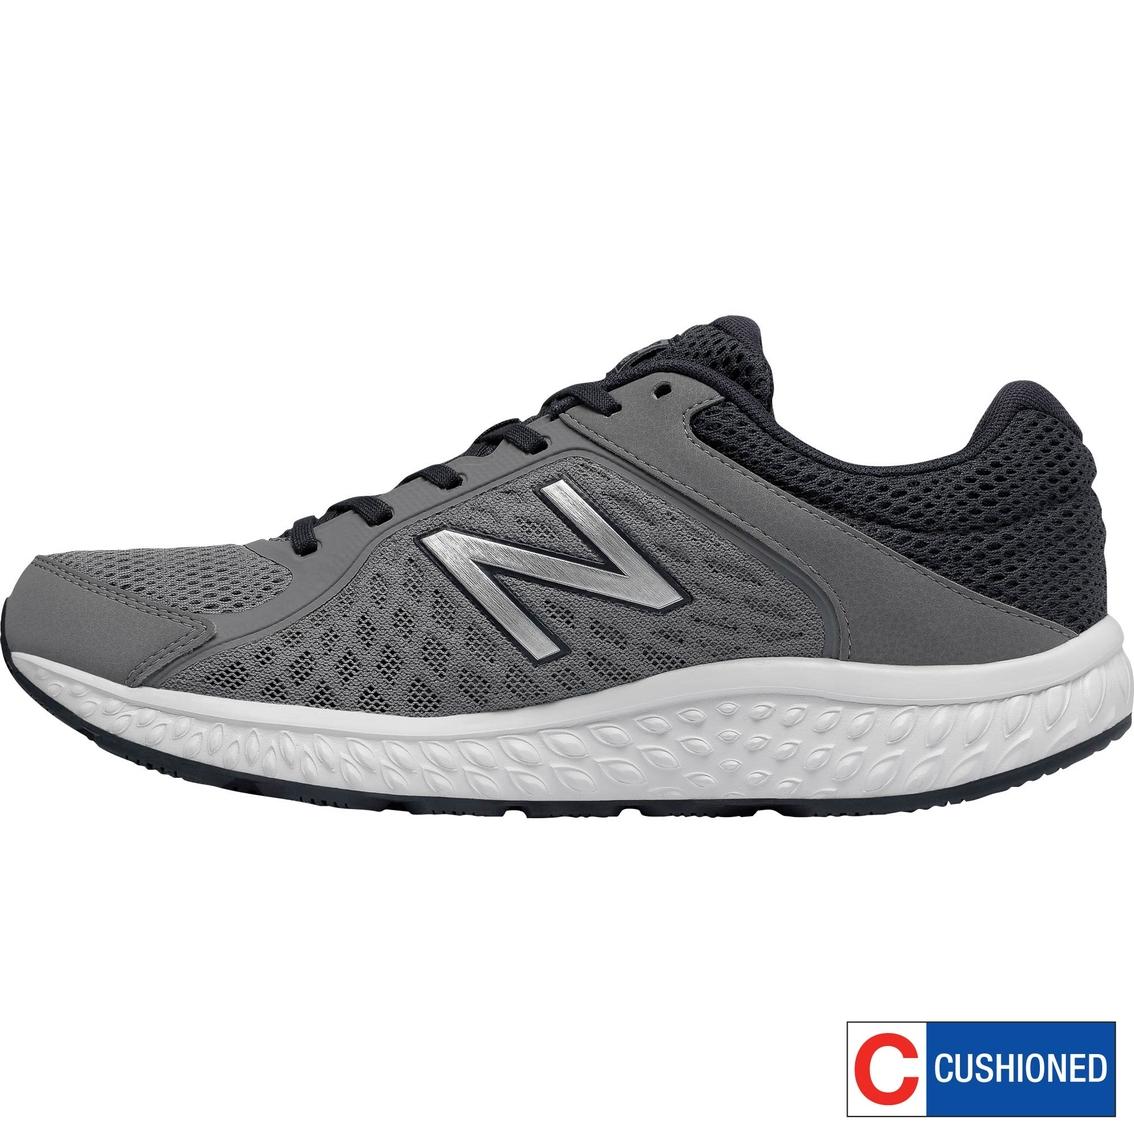 3fb8a10e96 New Balance Men's M420lg4 Cushioned Running Shoes | Running ...